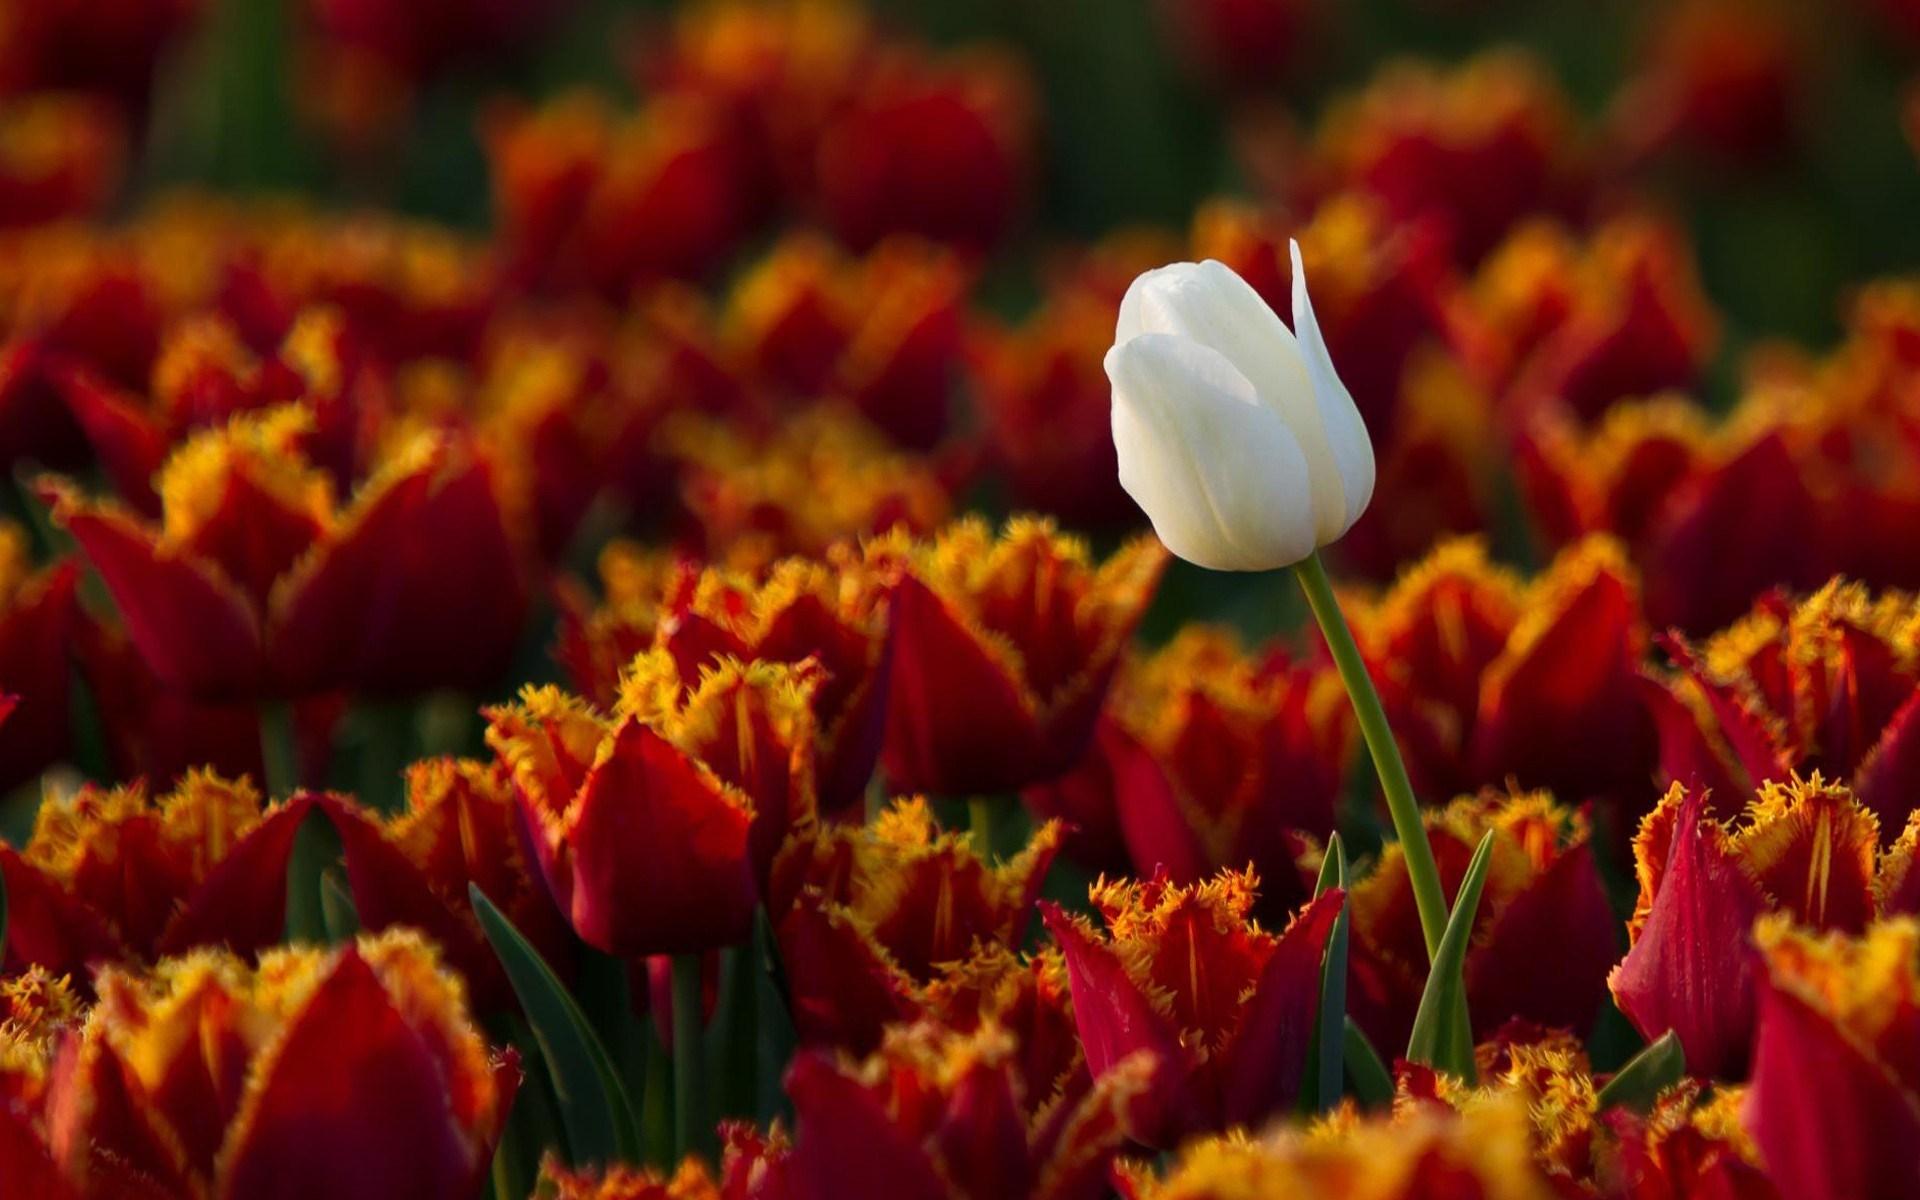 Flowers Tulips One White Amazing